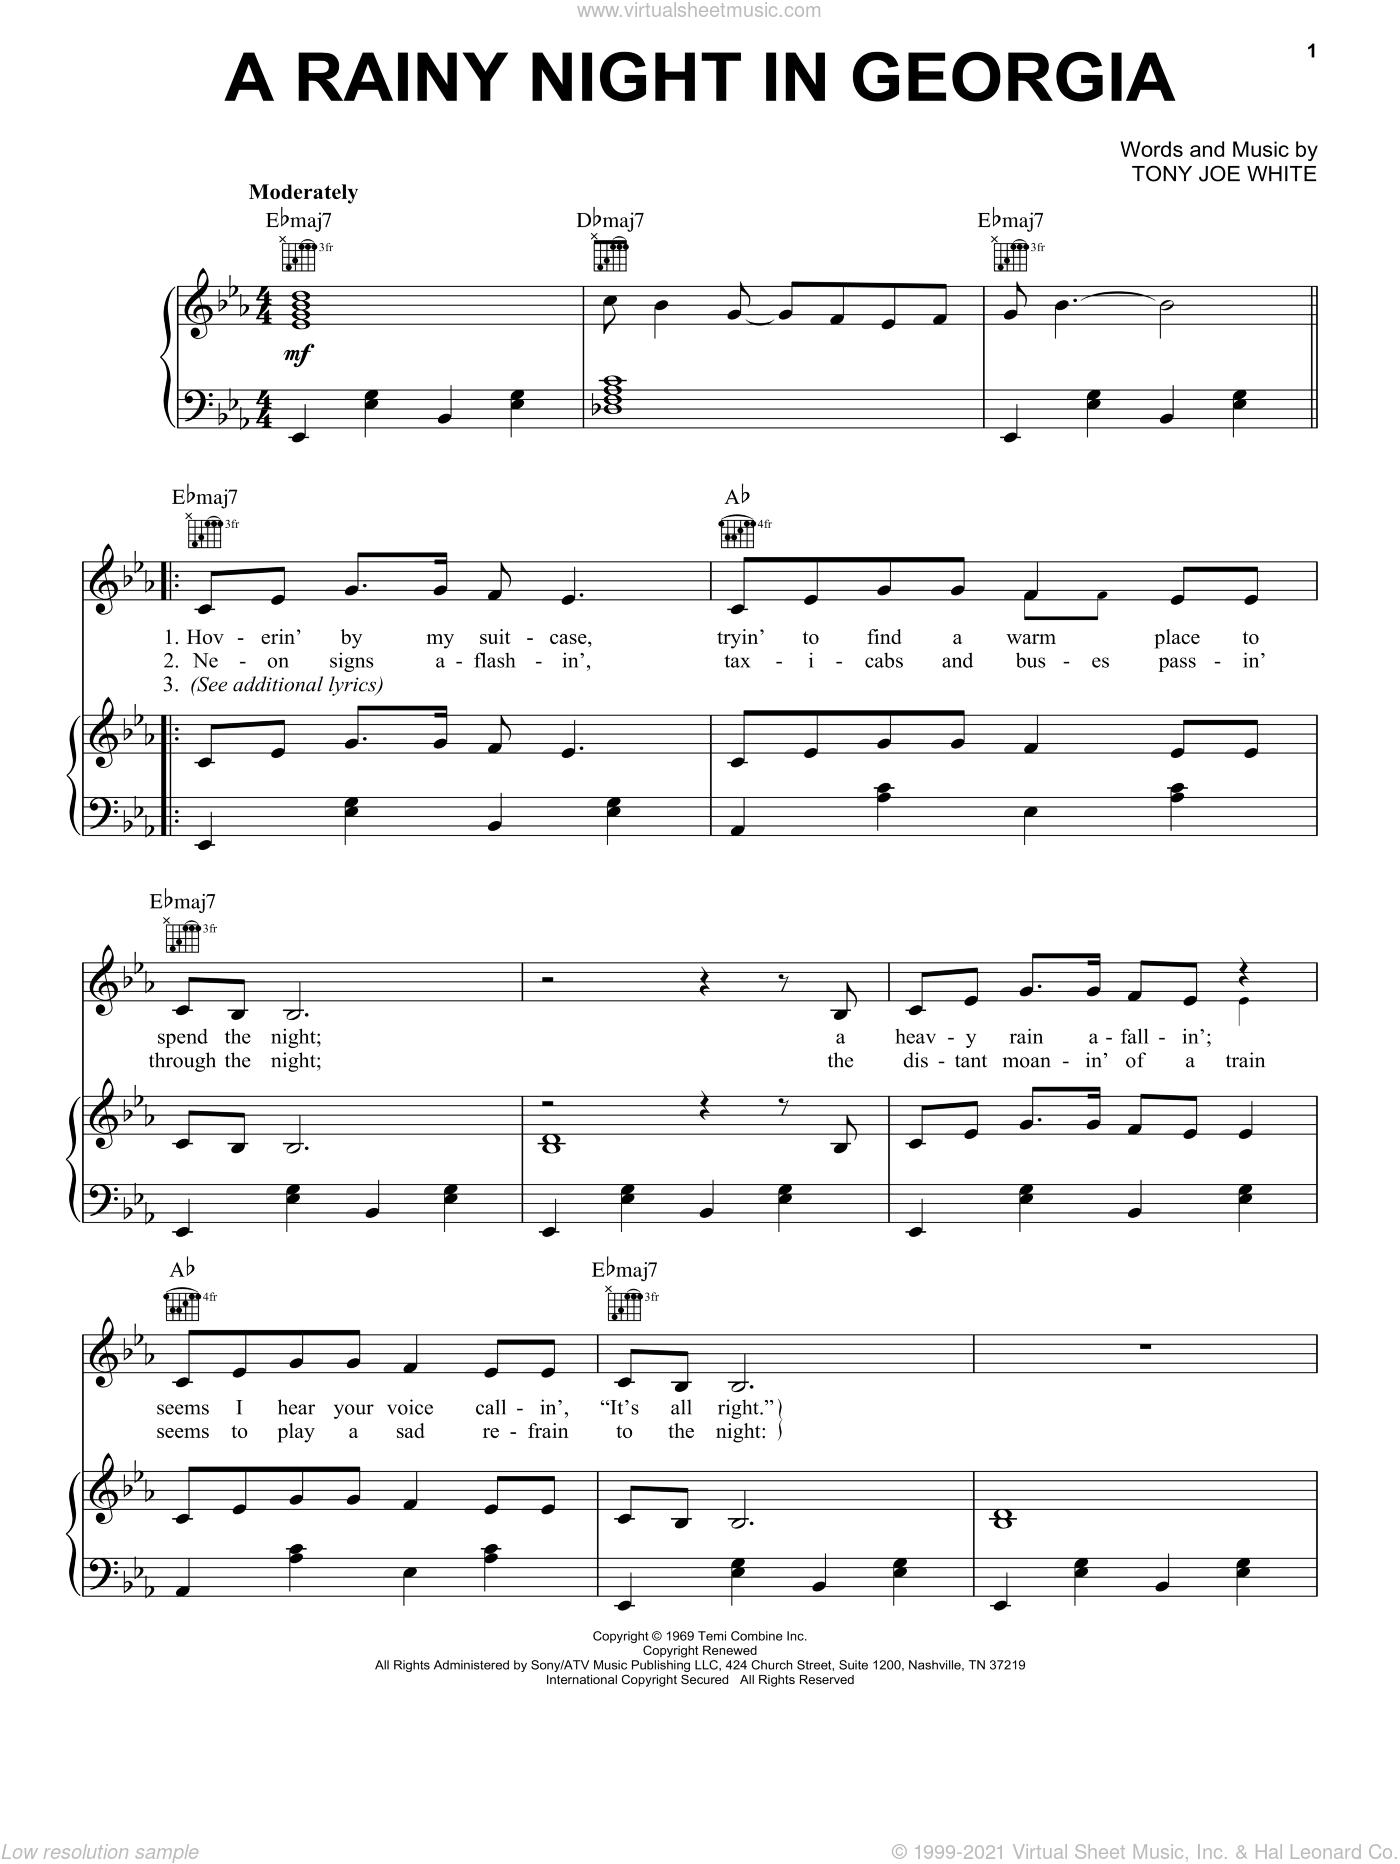 A Rainy Night In Georgia sheet music for voice, piano or guitar by Brook Benton and Tony Joe White, intermediate skill level